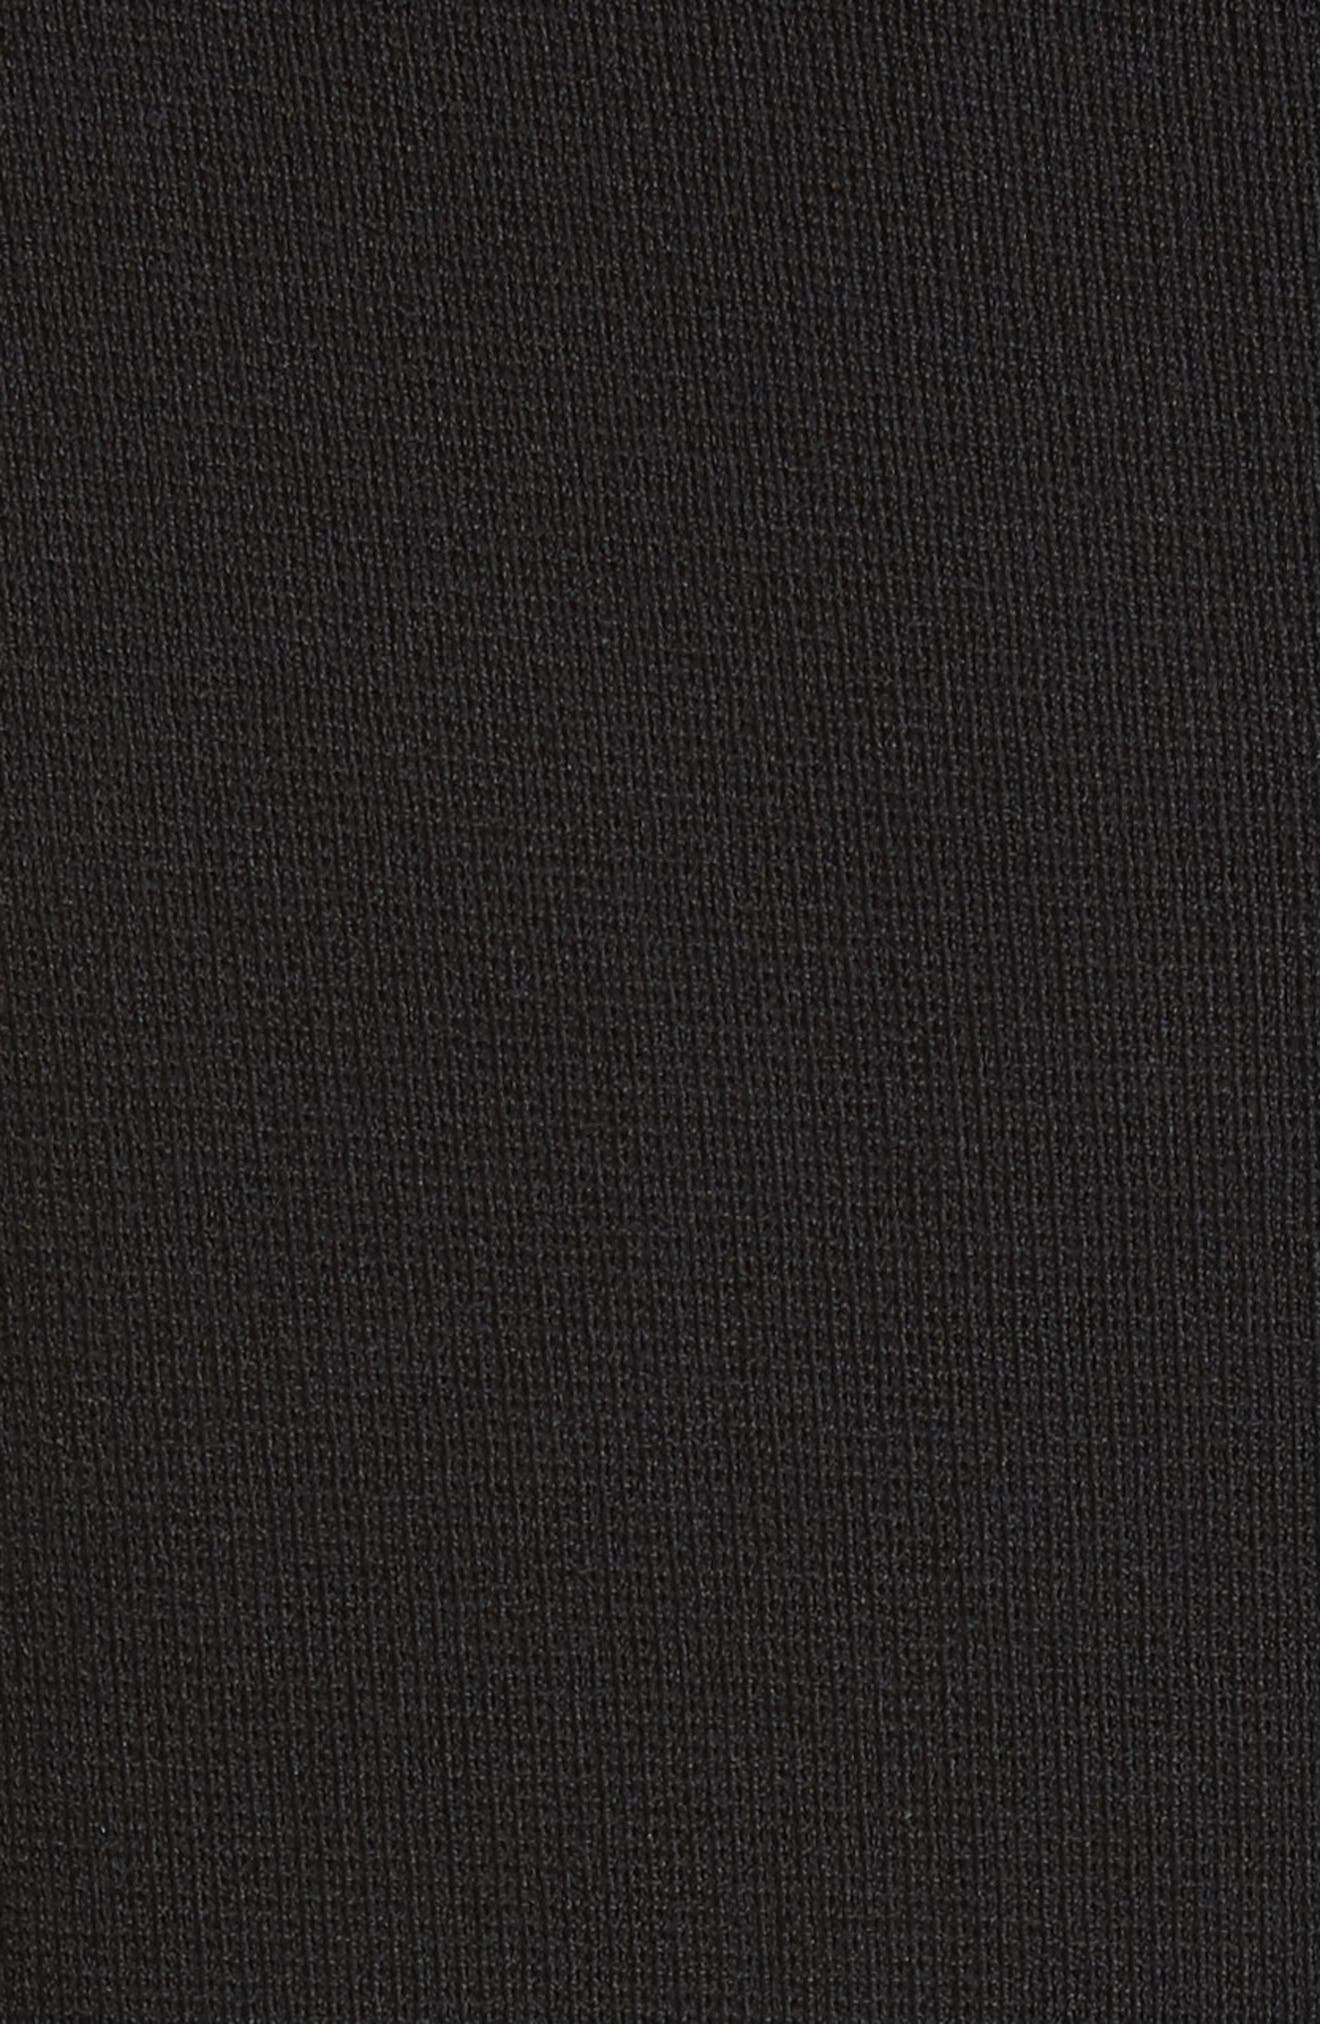 High Neck Fit & Flare Dress,                             Alternate thumbnail 6, color,                             Black